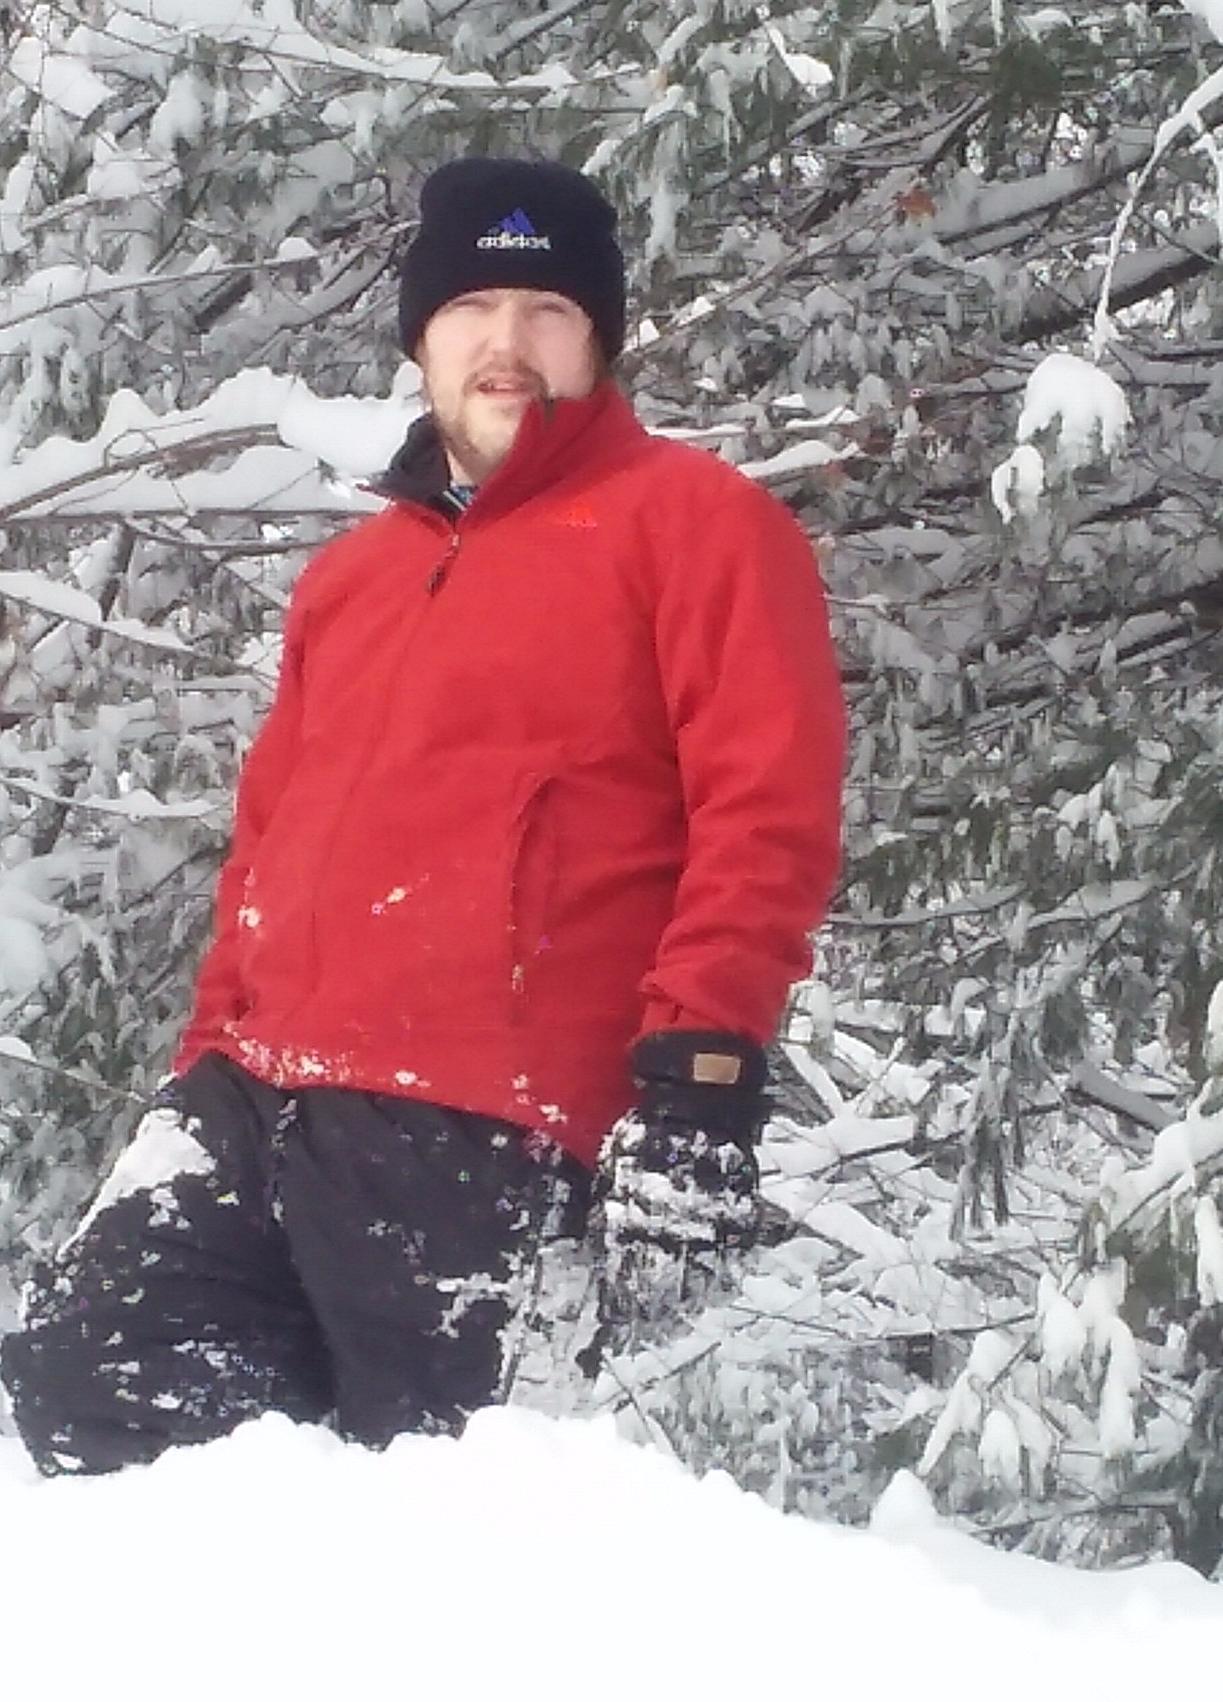 me-snow-mound.jpg